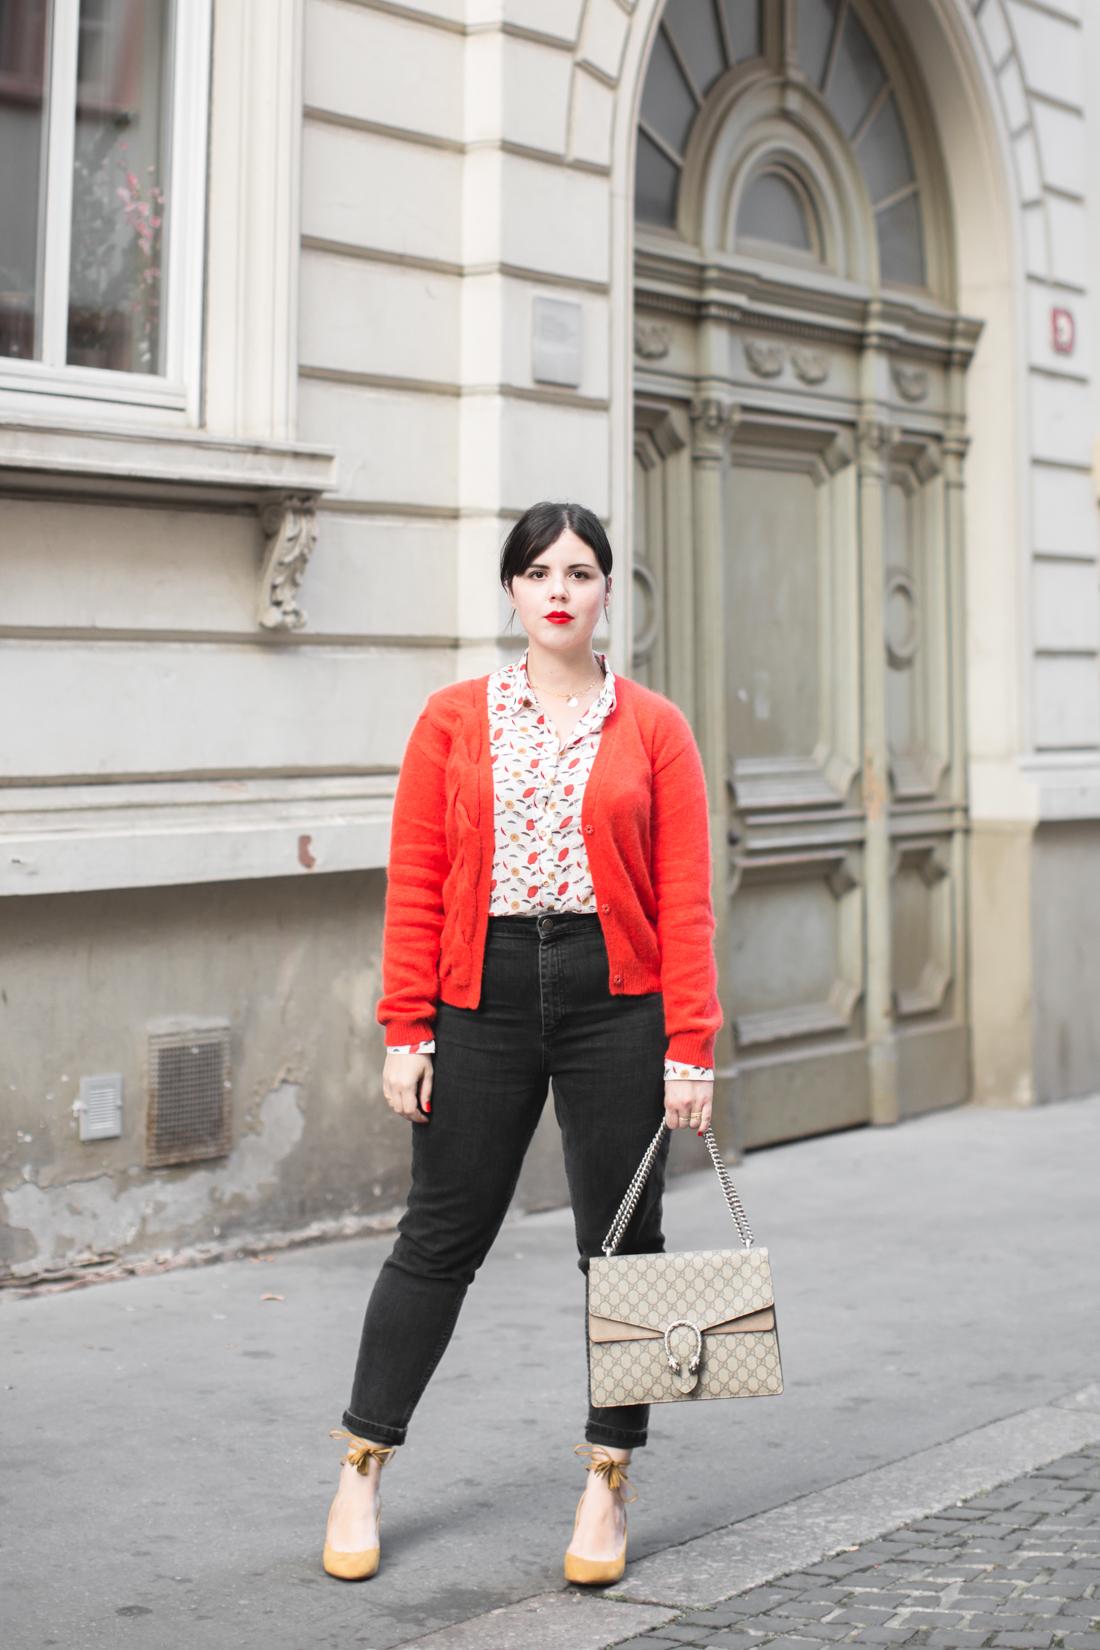 sezane-chemise-imprimee-valentina-curry-copyright-pauline-paulinefashionblog-com-4